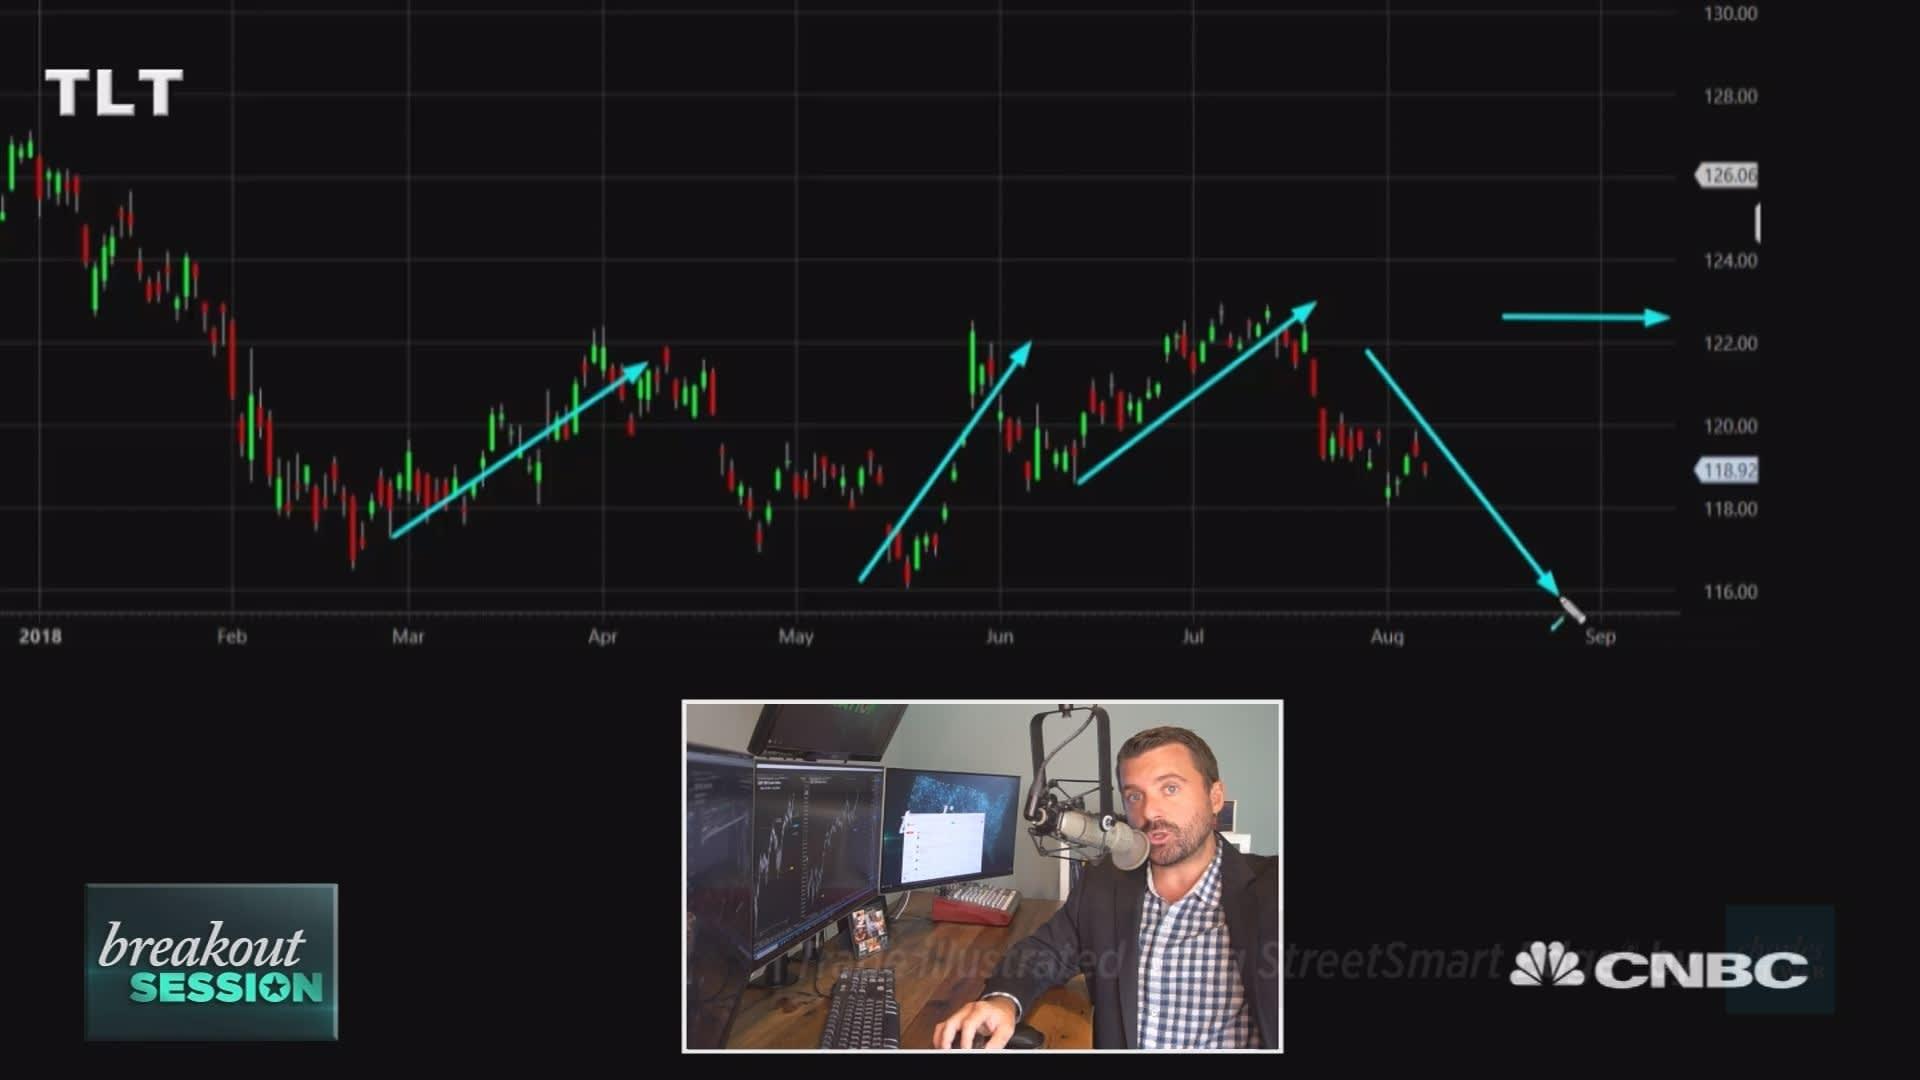 Bond Market Drama Builds Around Auction That Could Bring Highest